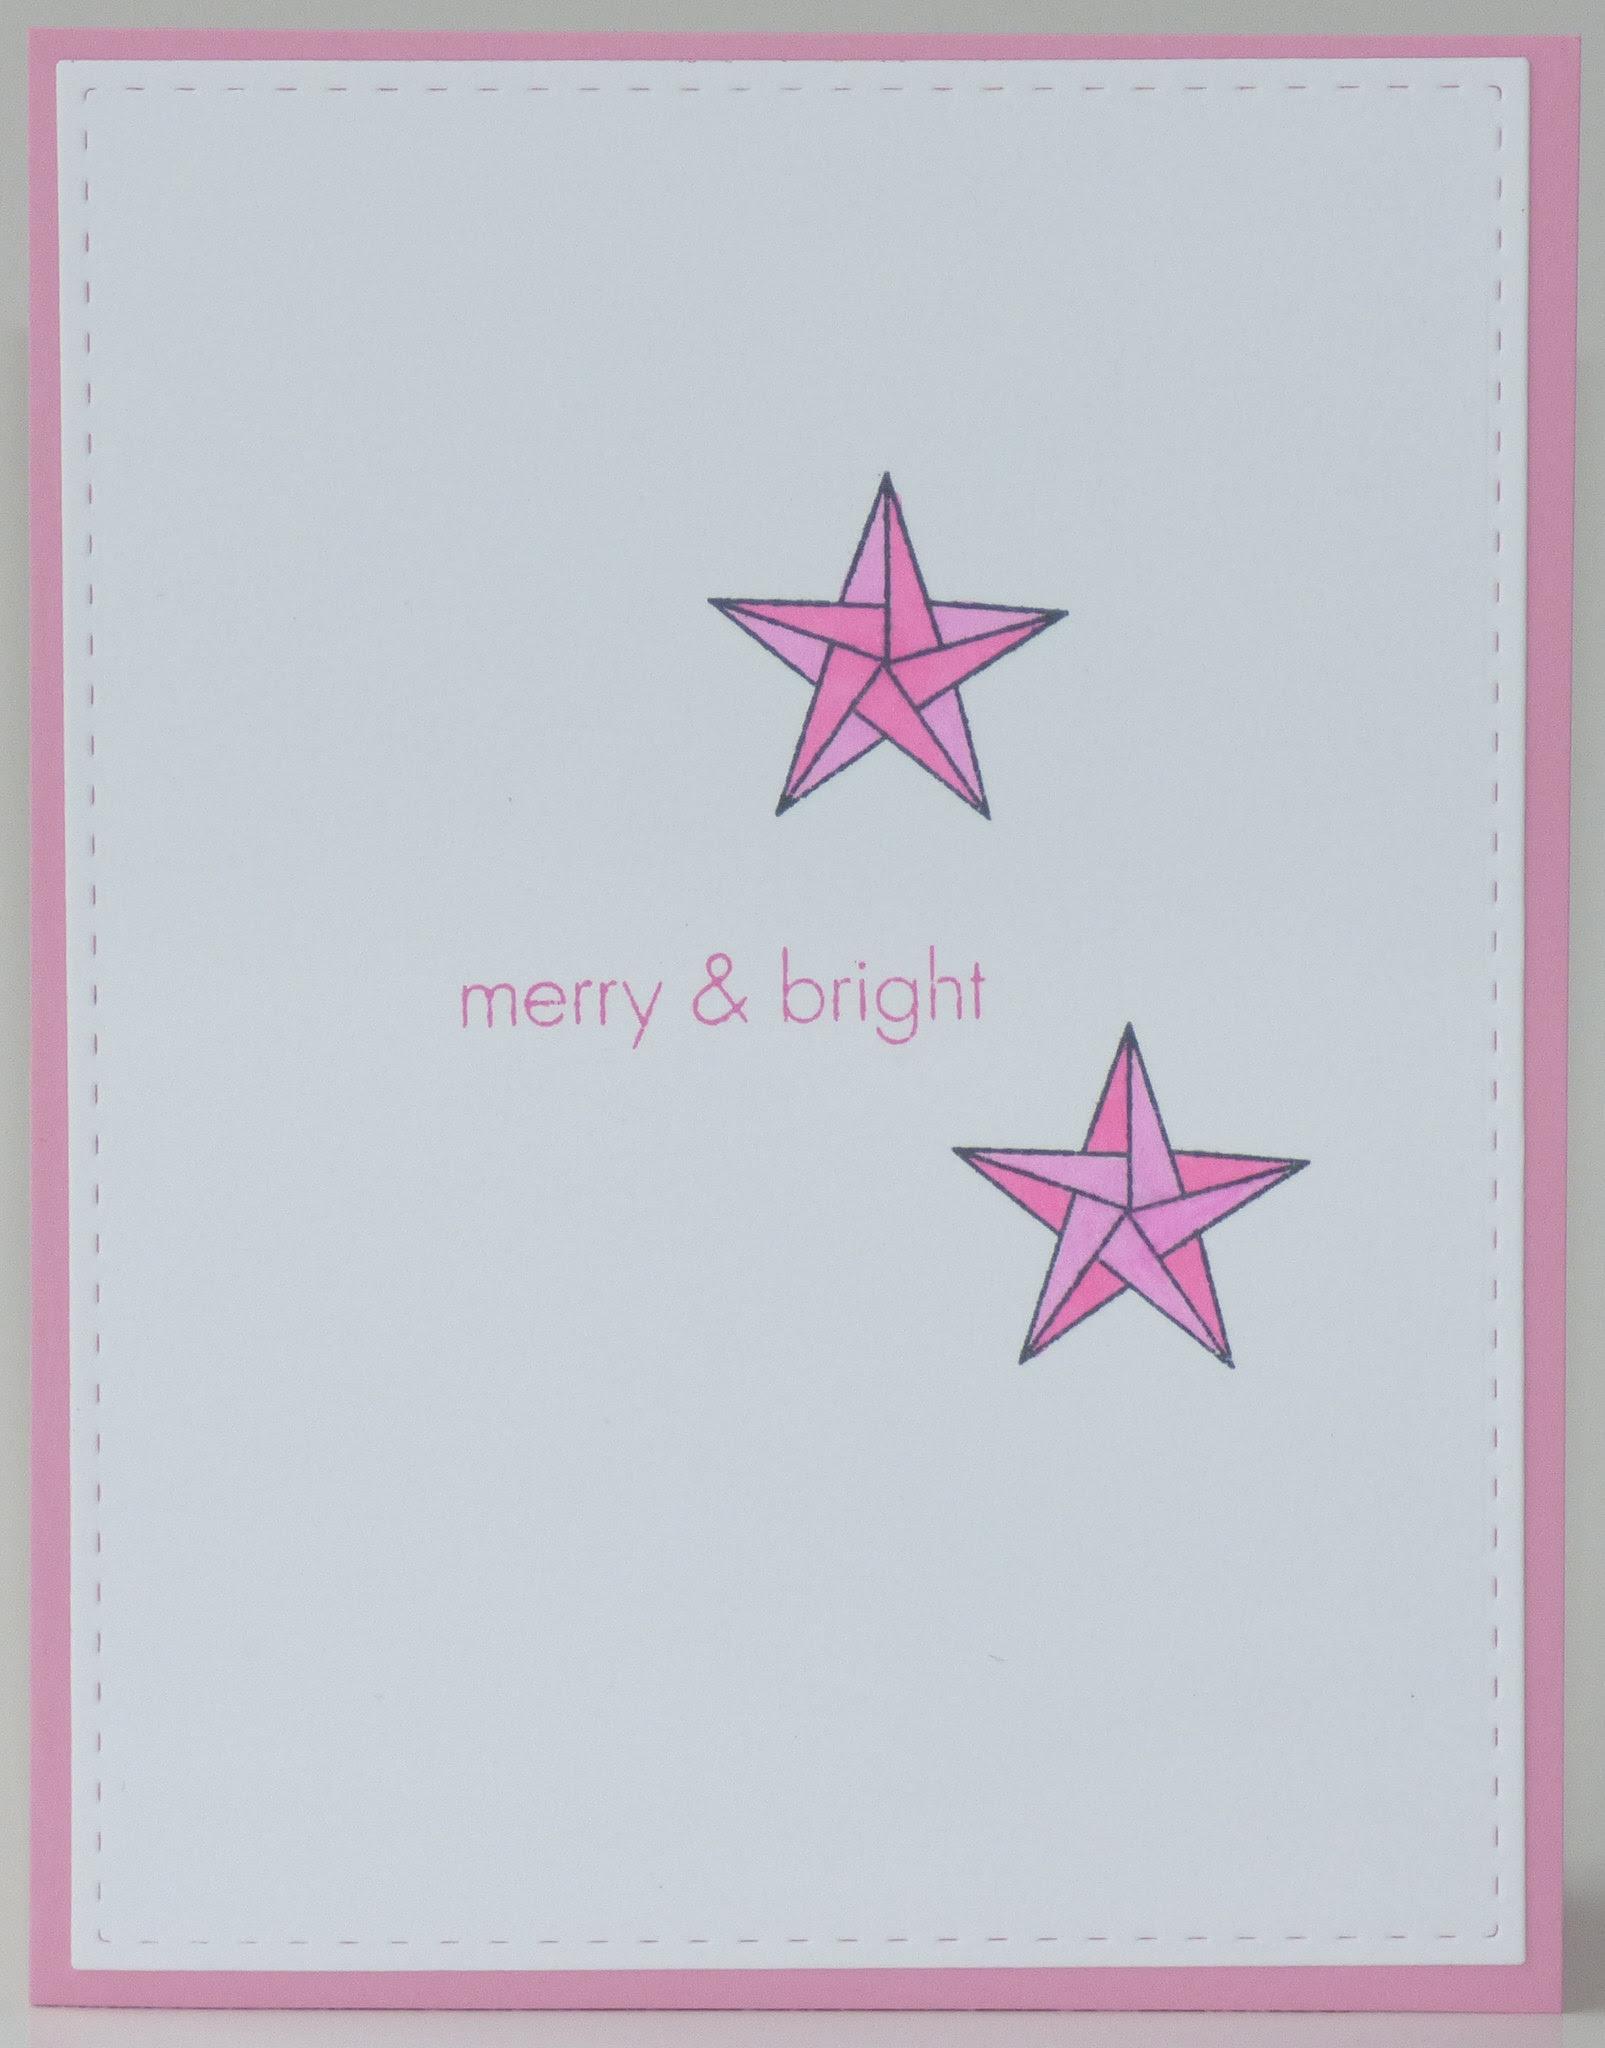 https://flic.kr/p/PBfZ31 | Pink Origami Stars | www.ablognamedhero.com/ Monochromatic  www.simonsaysstampblog.com/wednesdaychallenge/ Let's get ready for Christmas  catchthebugblog.blogspot.com/ #616 - Sketch  papercraft-challenges.blogspot.com/ #21 - Stars  jinglebellesrock.blogspot.com/ Pink Christmas  Stitched Die : SimonSaysStamp All Stamps : Hero Arts